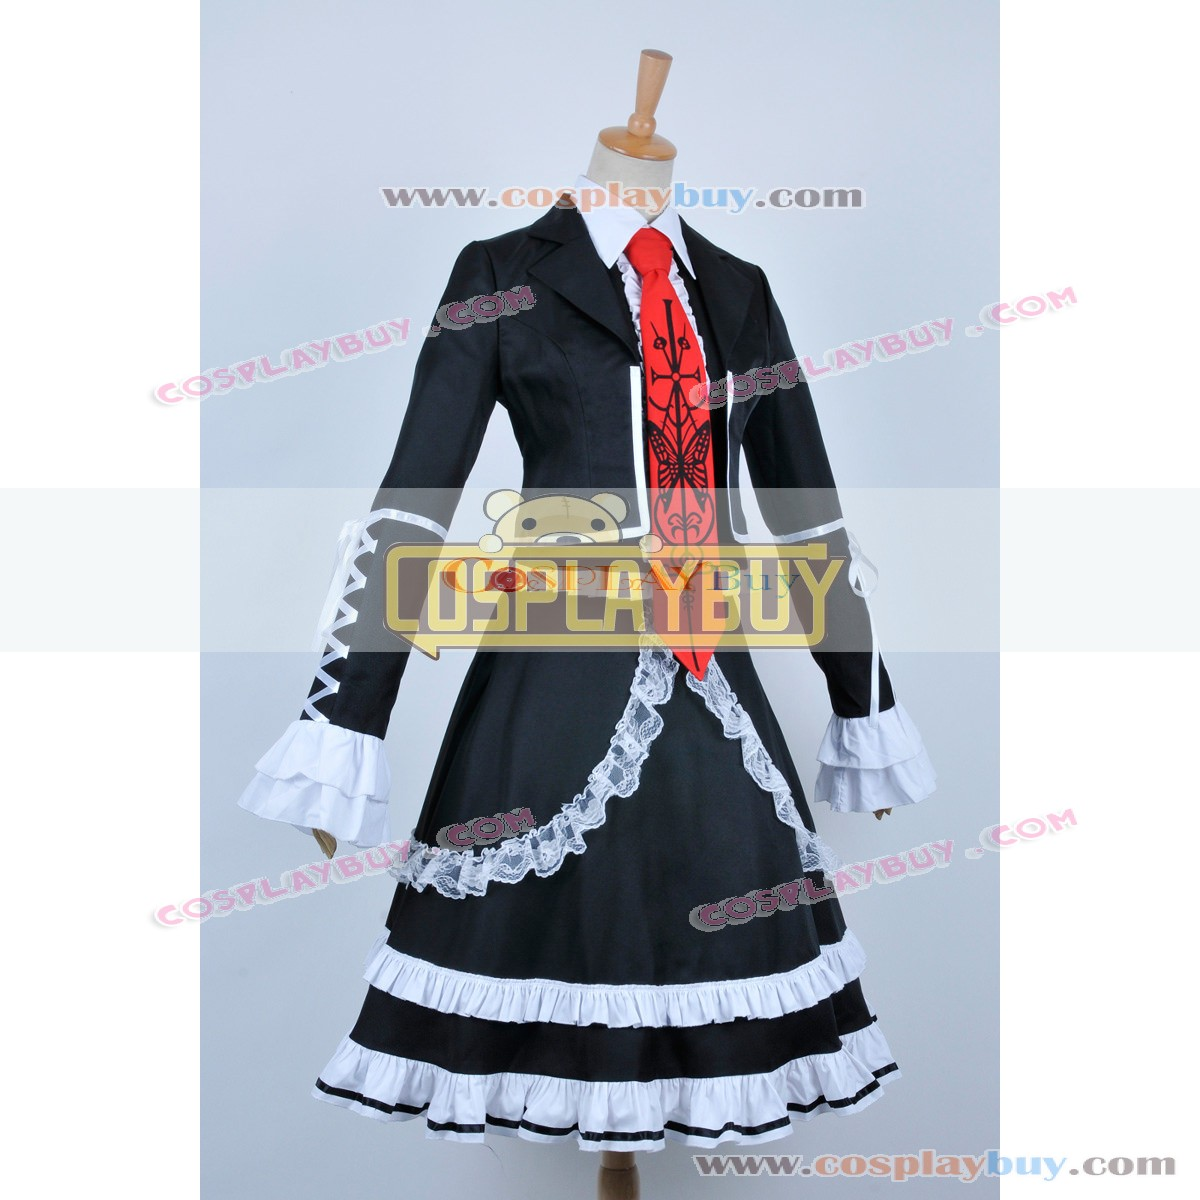 Dangan Ronpa Danganronpa Celestia Ludenberg Dress Cosplay Costume